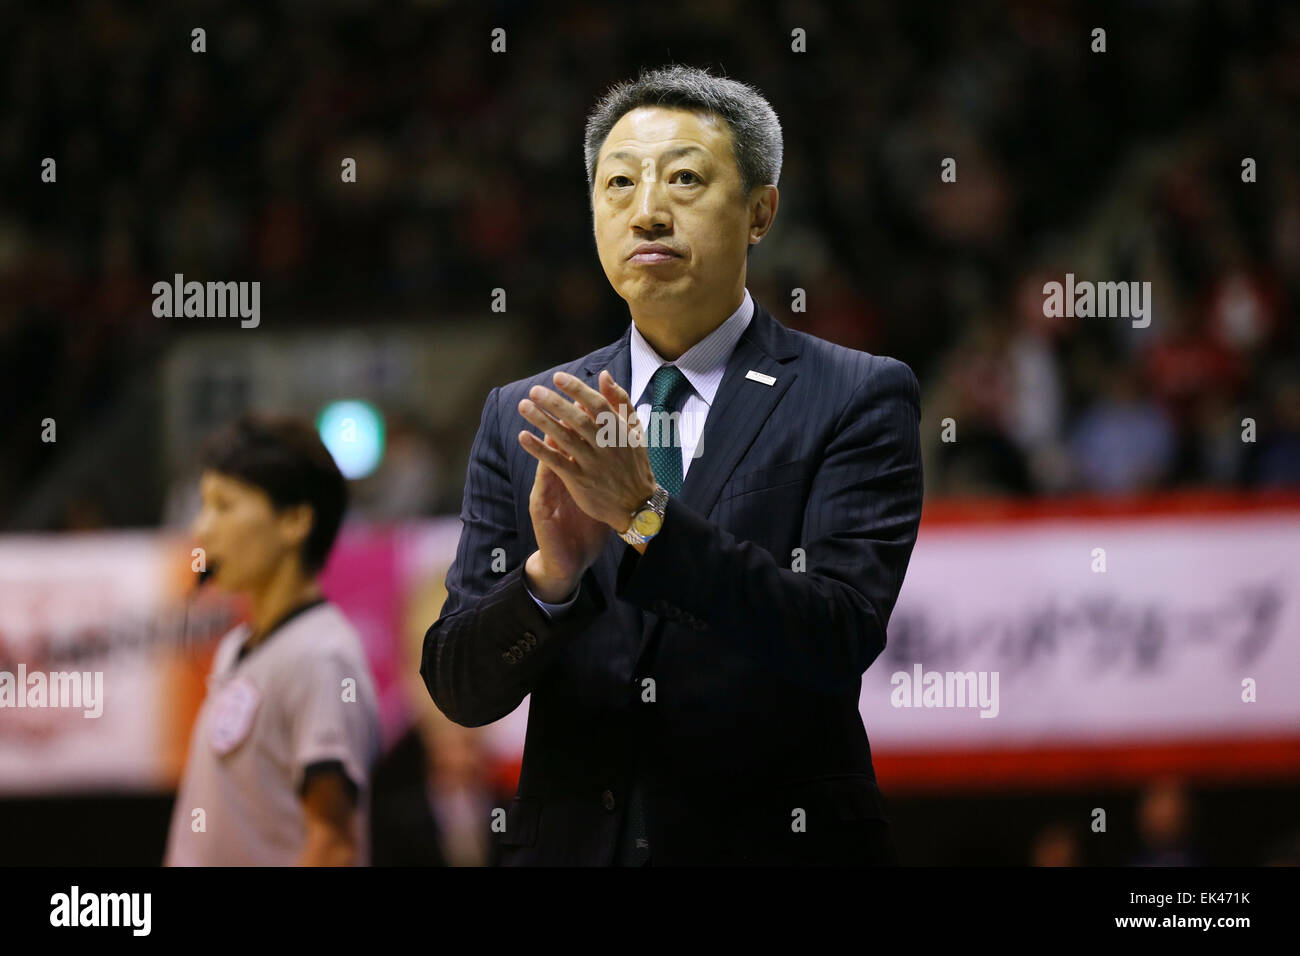 Kiyomi and lauren dating coach